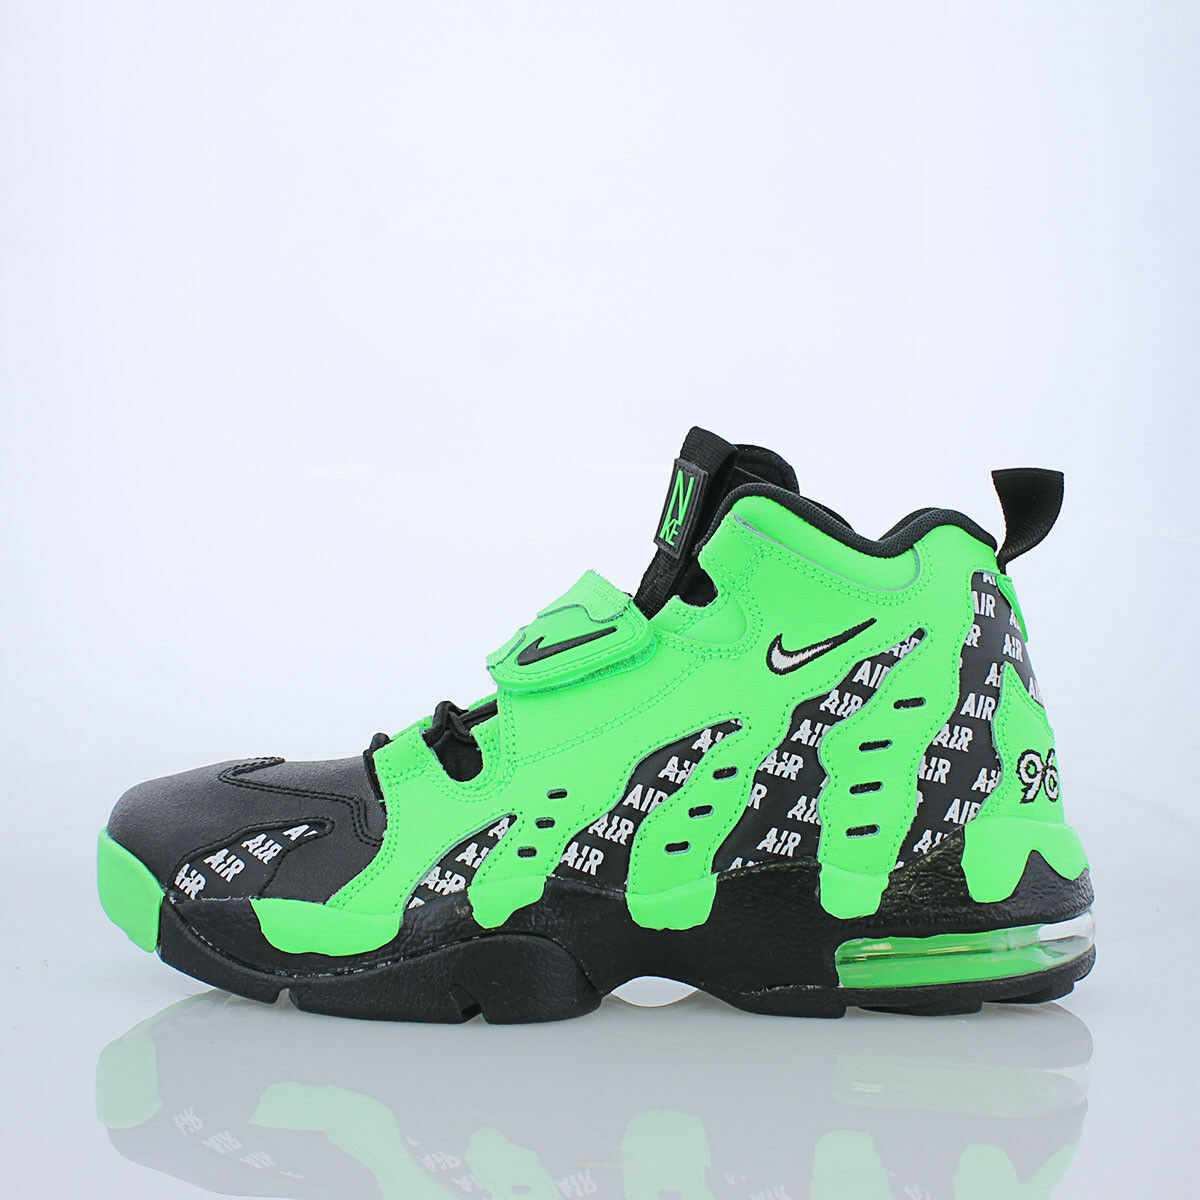 Nike Air DT SZ Max '96 SOA SZ DT 11.5 Rage vert noir blanc AQ5100-300 2d101f